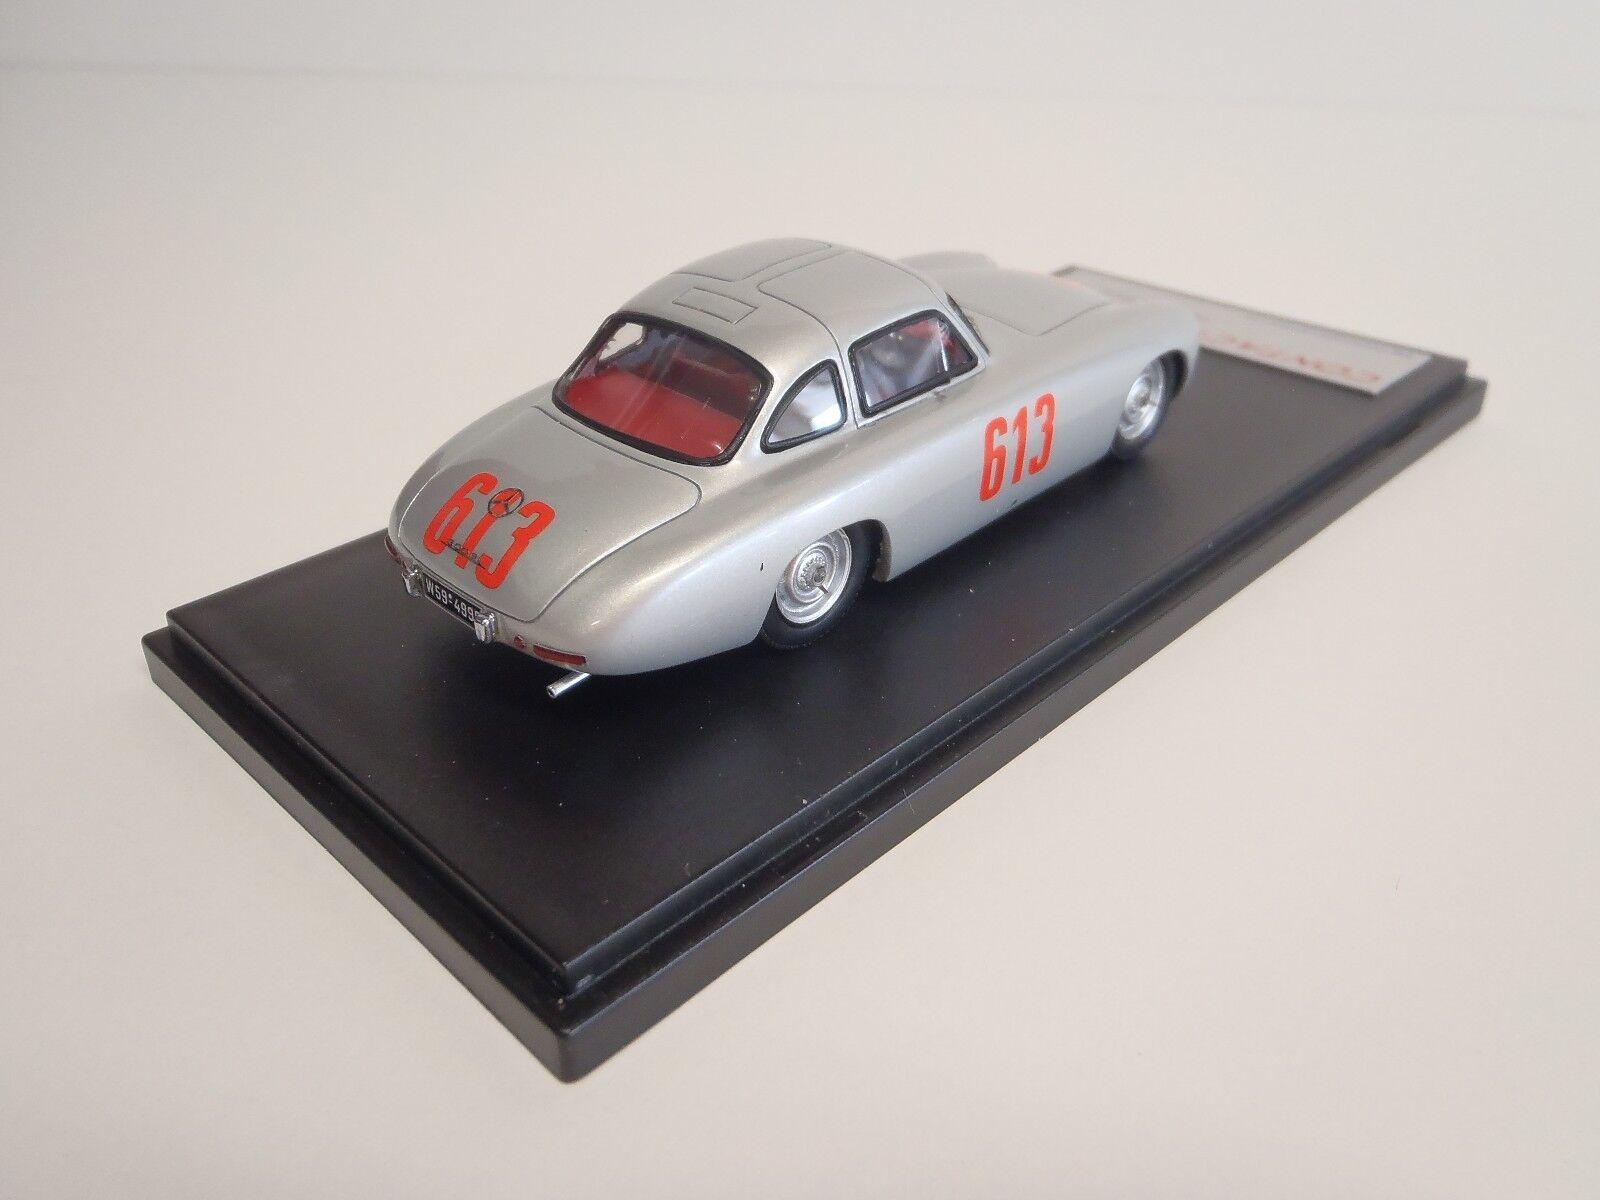 300SL Mercedes 1952 -W194 4th place in Mille Miglia